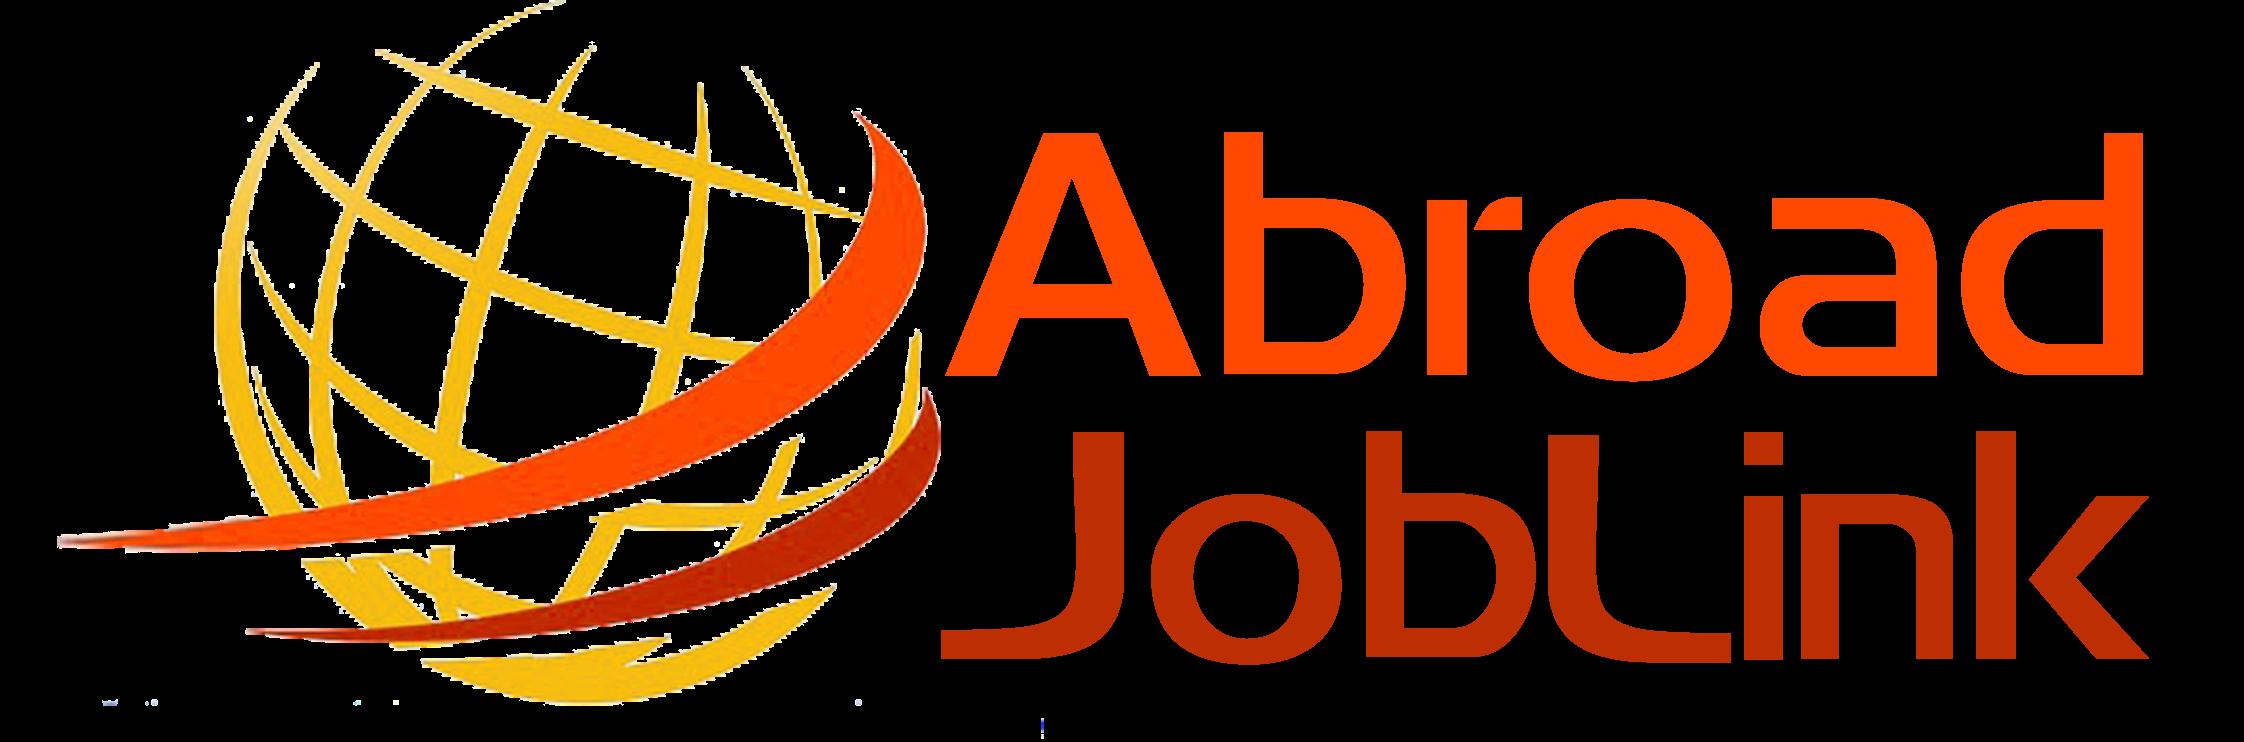 world's largest jobs platform